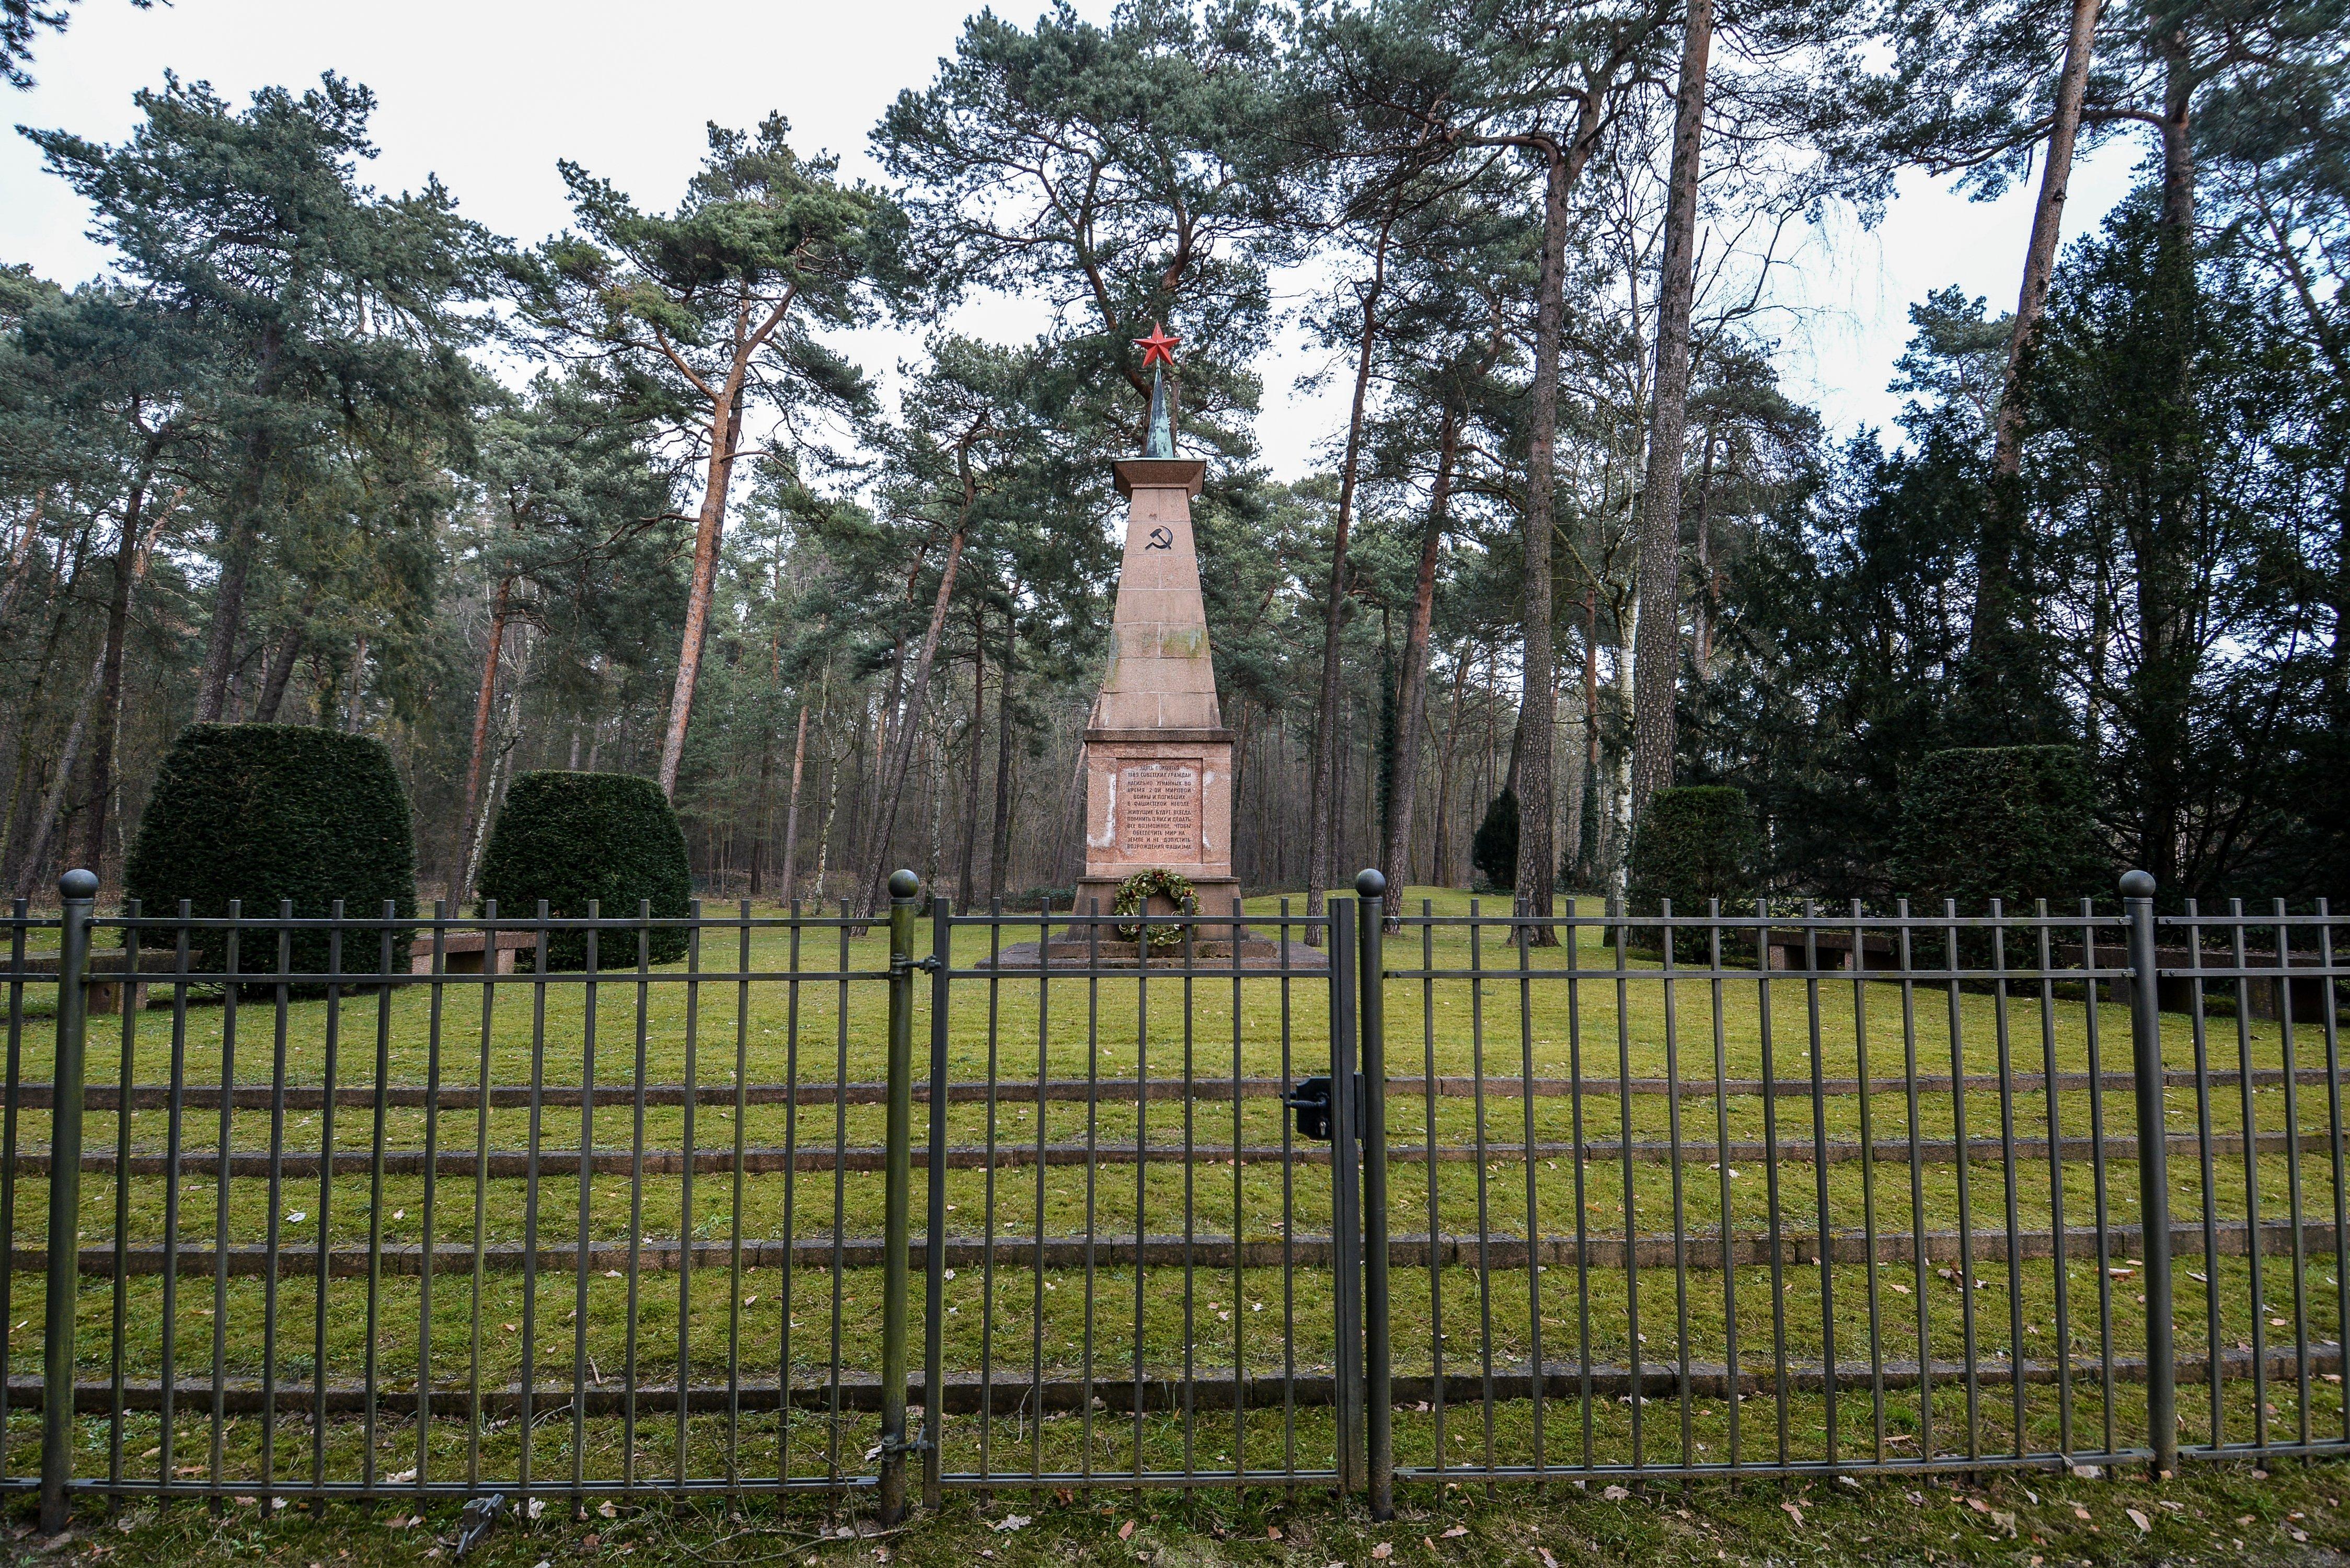 locked gates sowjetisches ehrenmal gueterfelde soviet war memorial gueterfelde front obelisk russian monument war graves brandenburg berlin germany